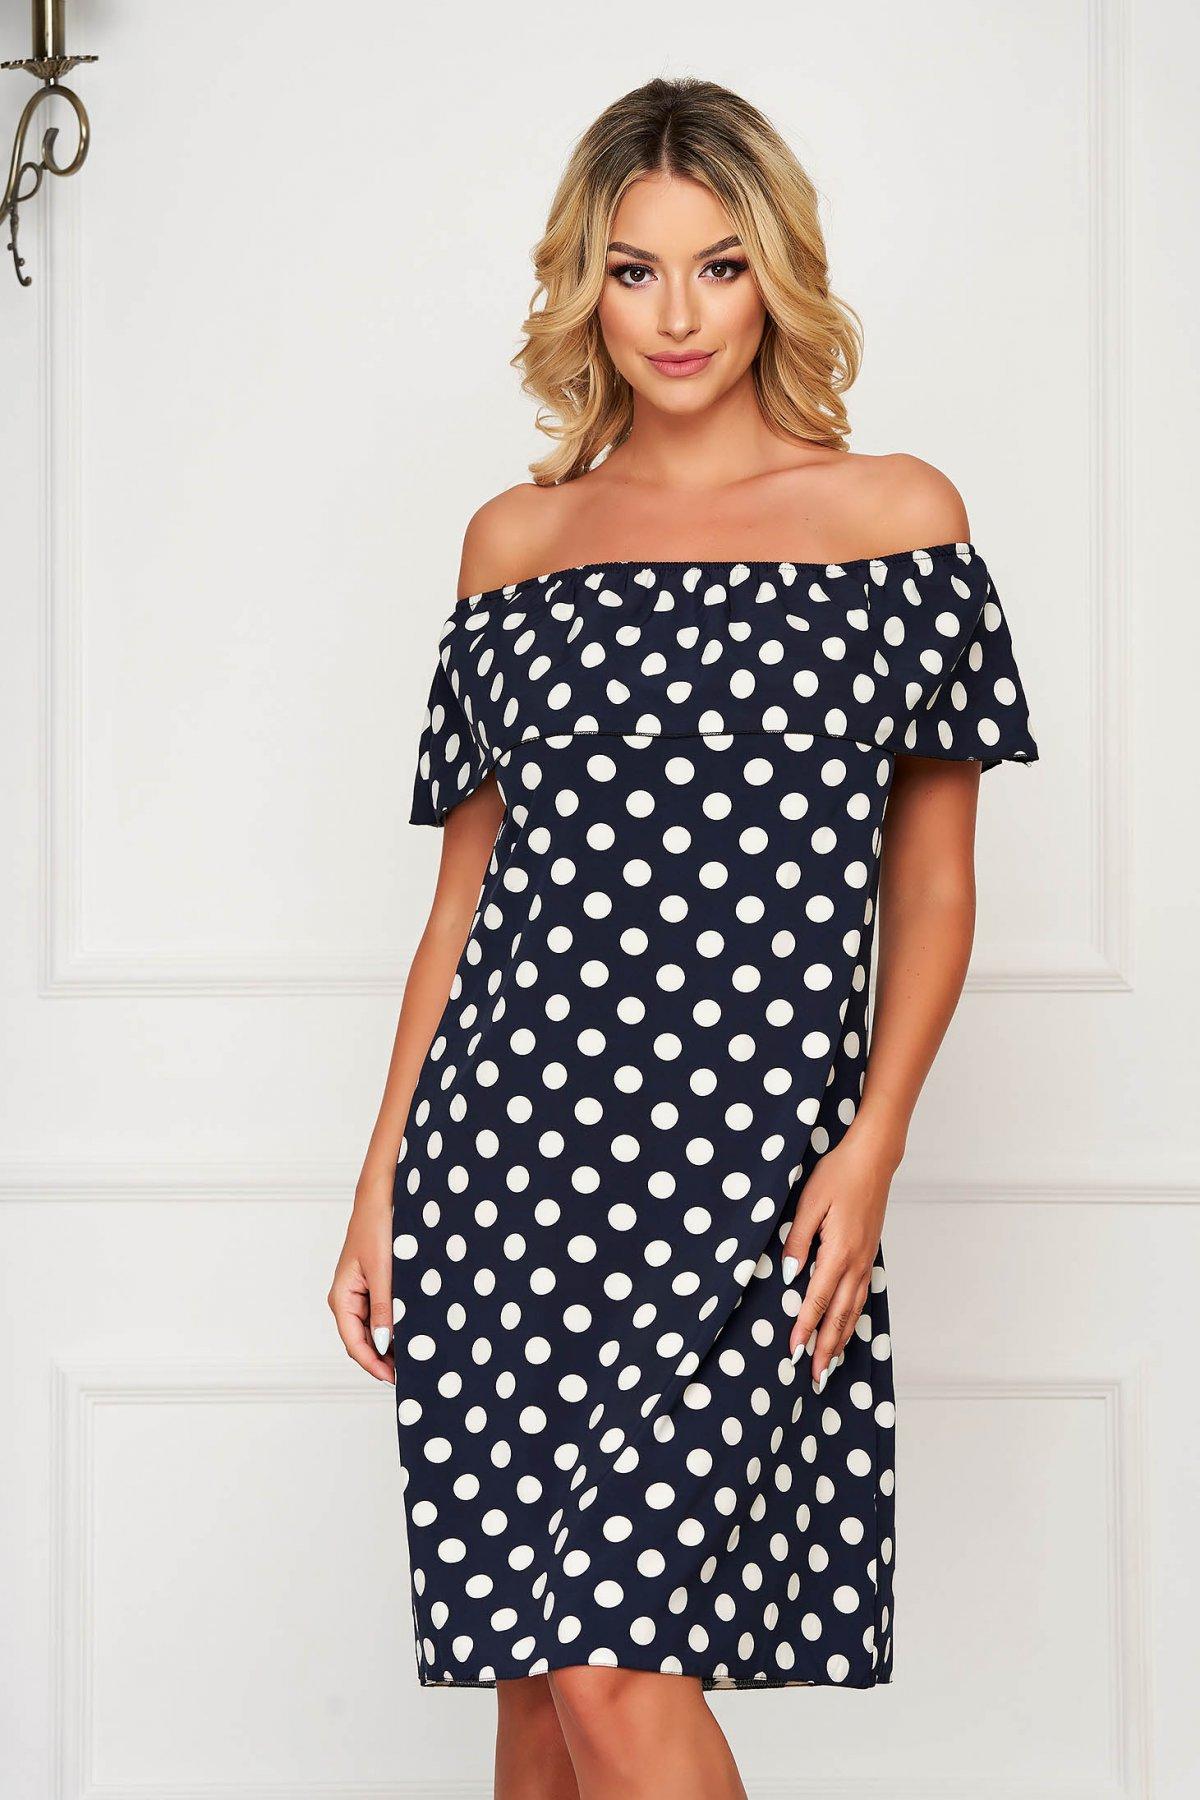 Rochie albastru-inchis SunShine scurta de zi din material subtire cu croi larg si umeri goi